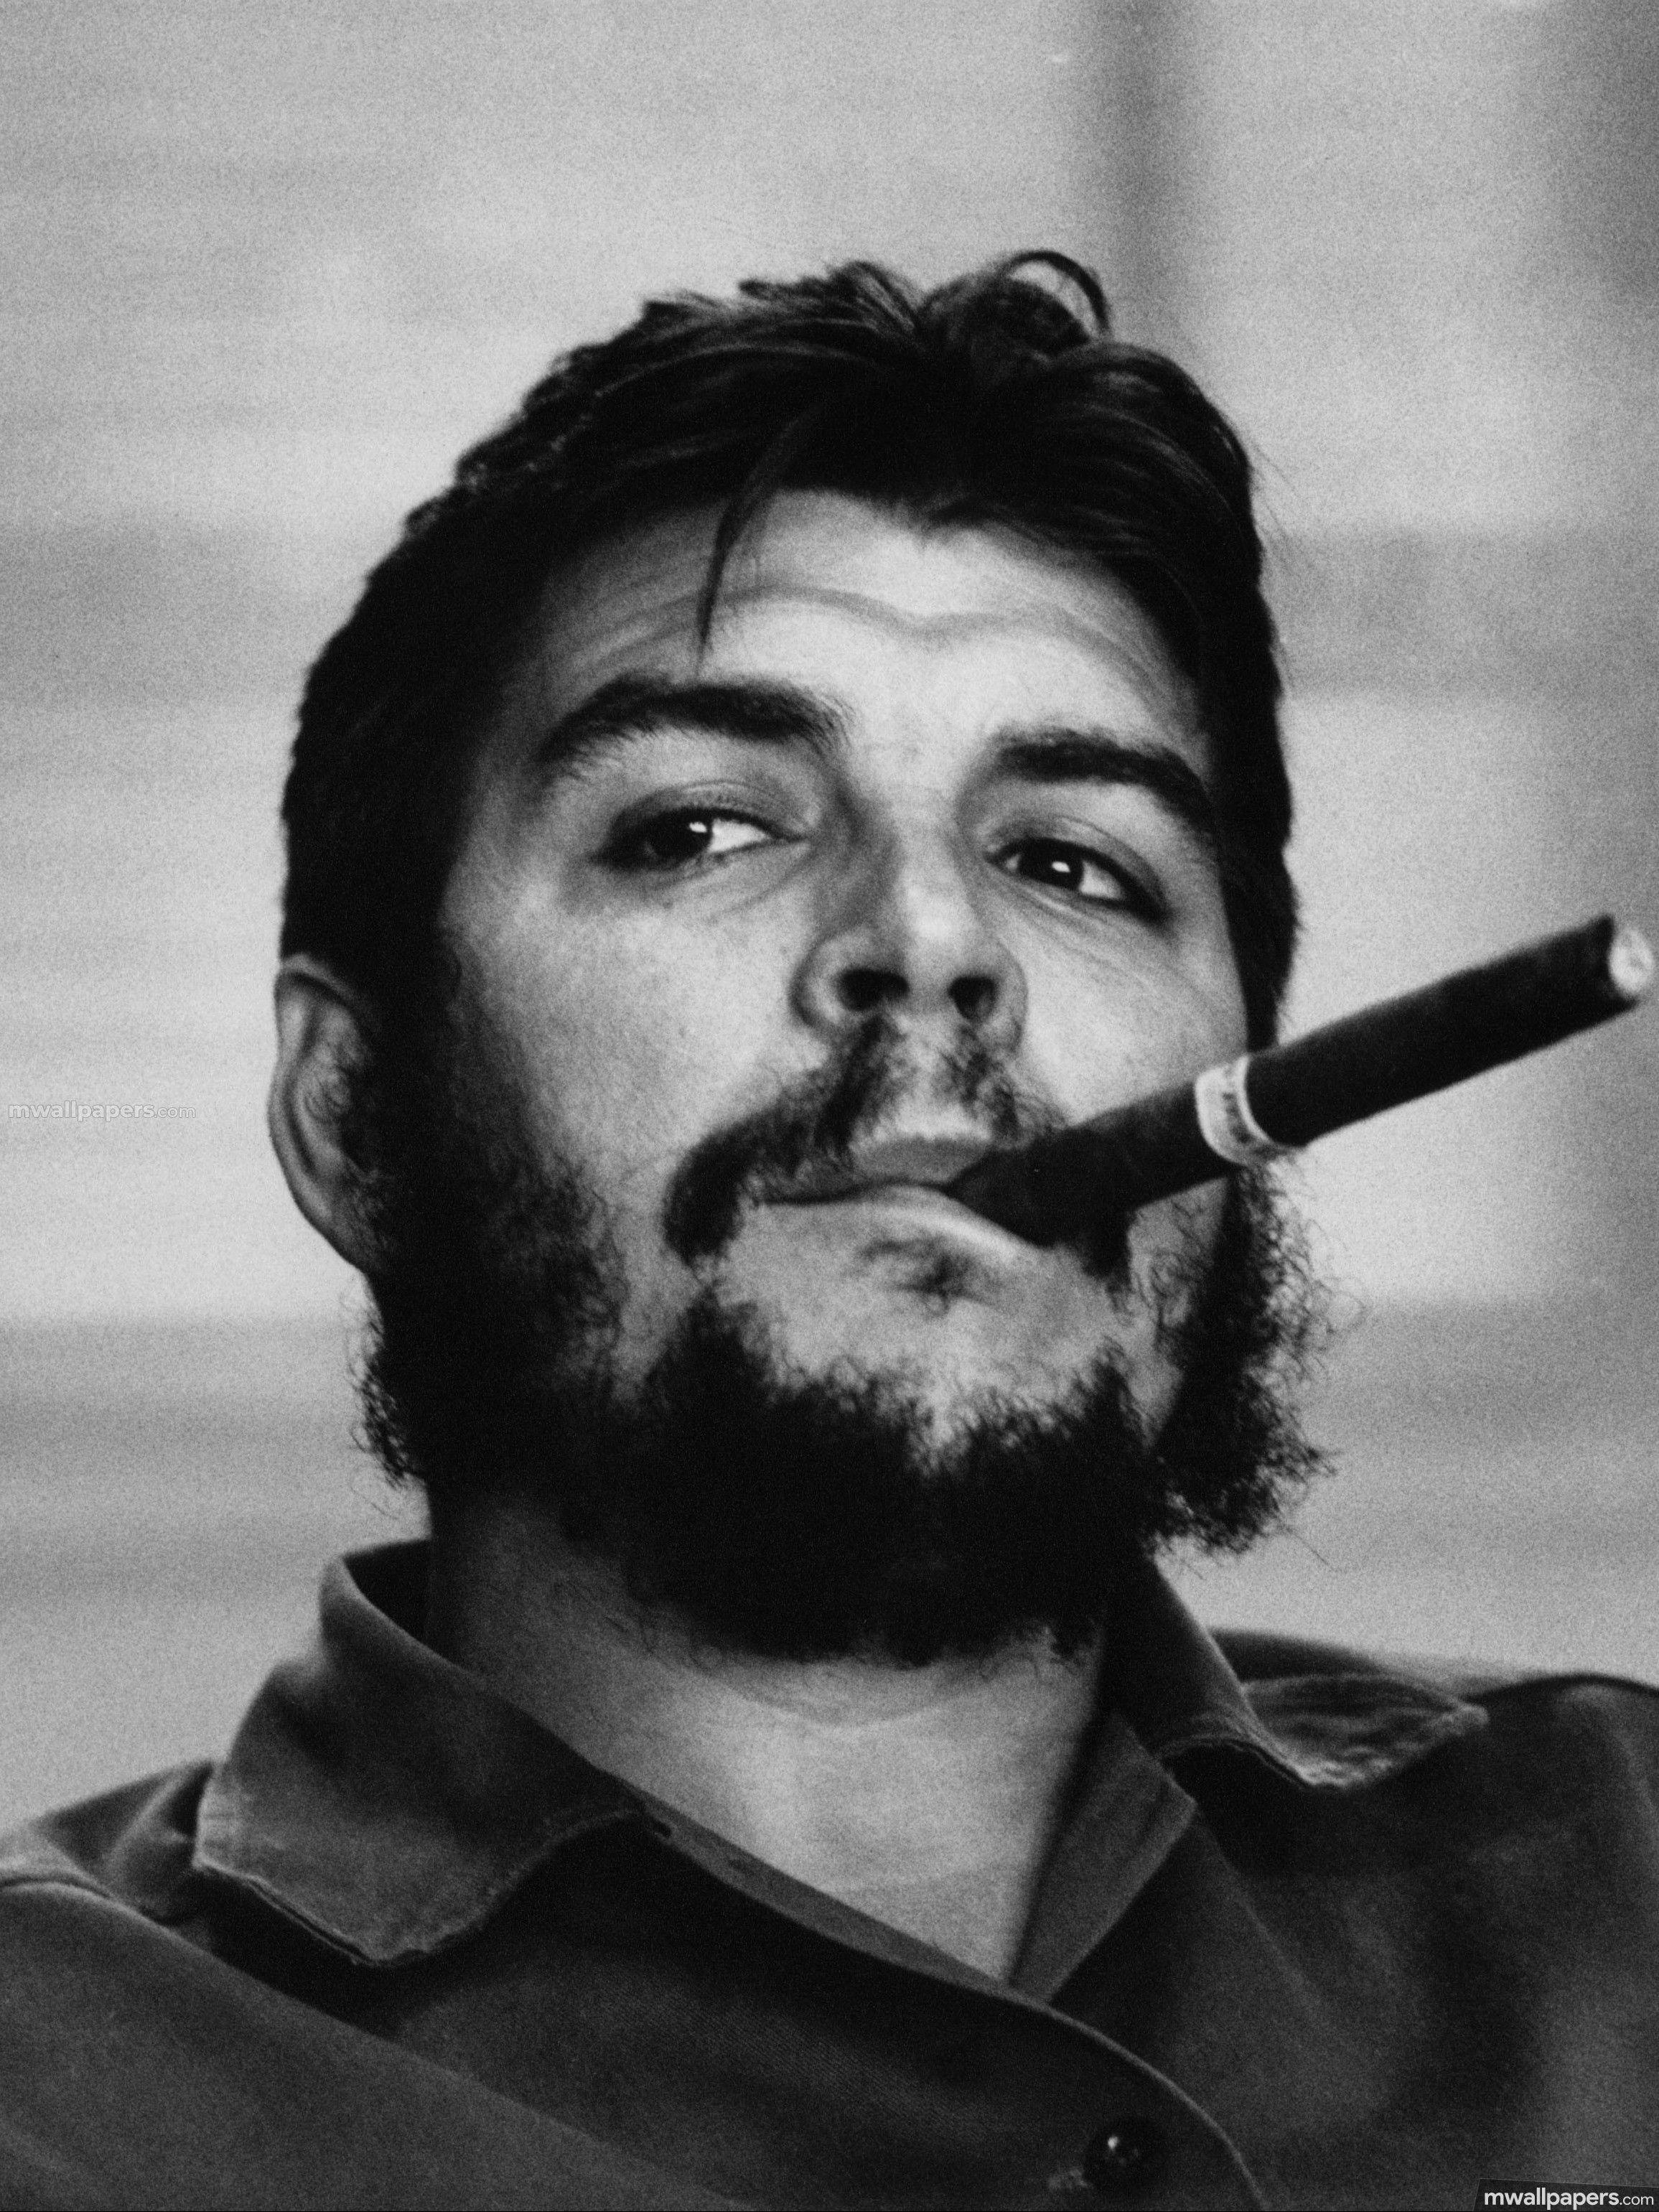 Che Guevara Wallpapers Hd Best Hd Photos 1080p 12735